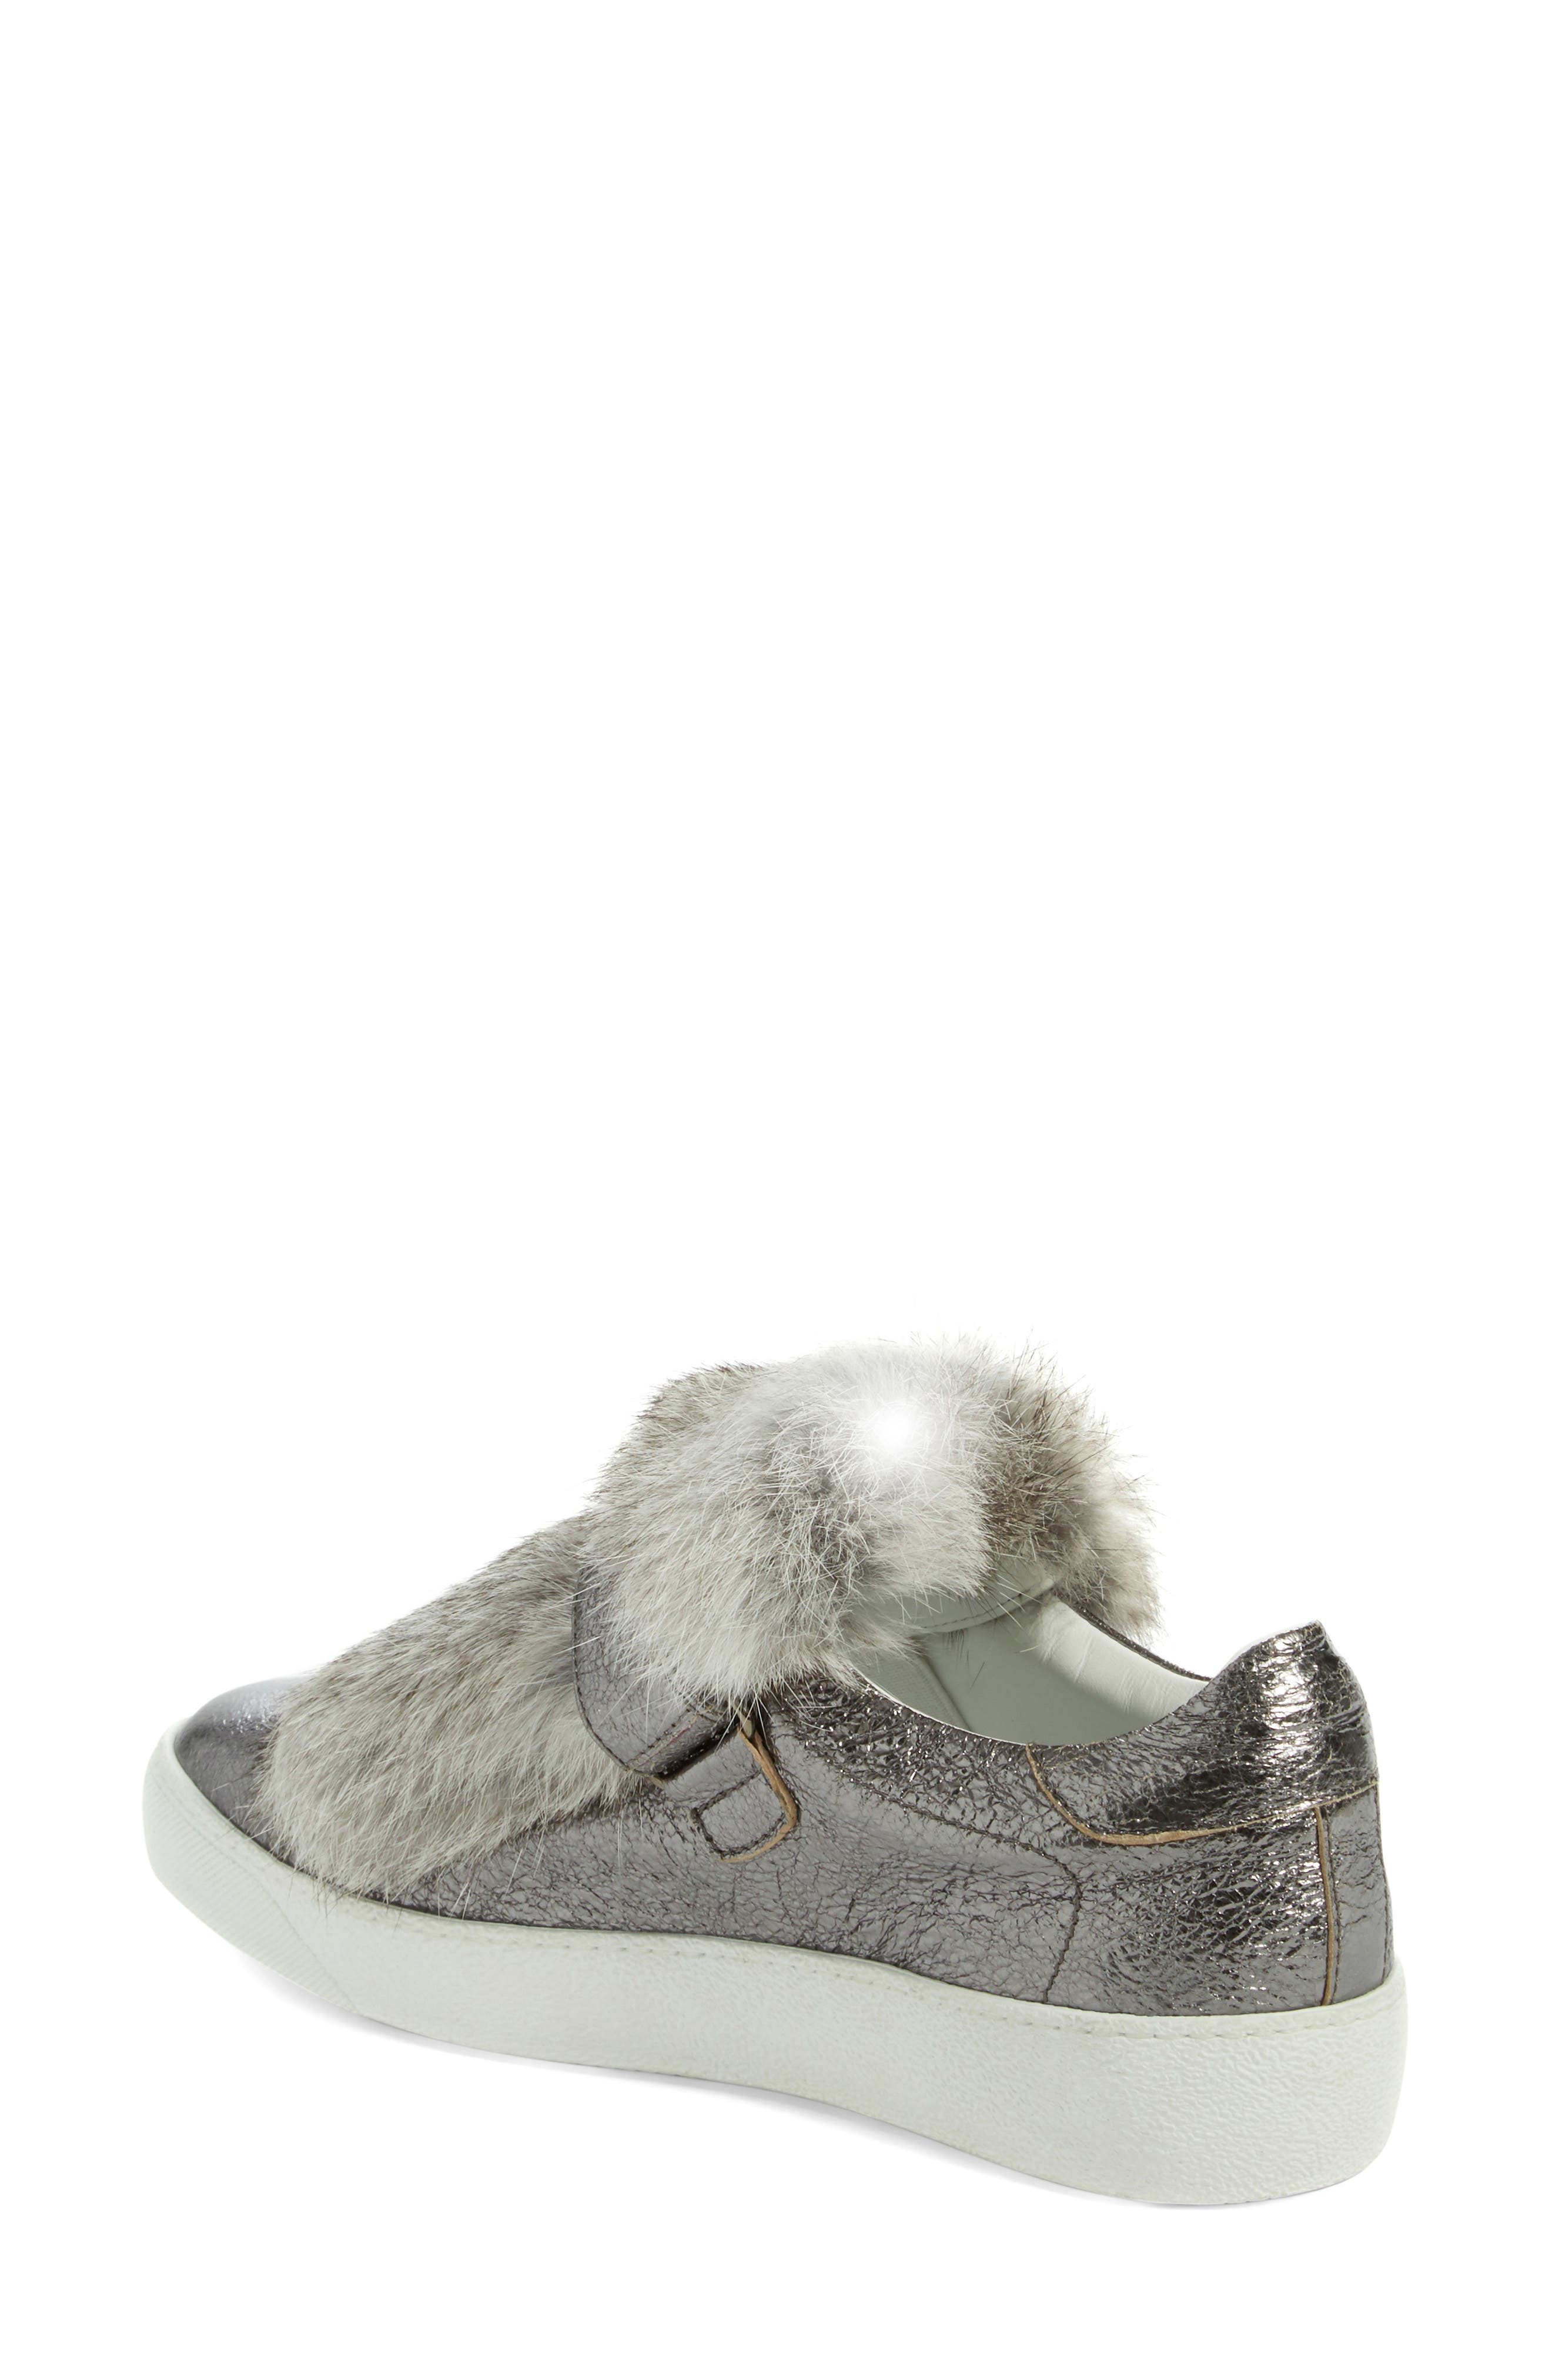 MONCLER, 'Lucie Scarpa' Genuine Rabbit Fur Trim Sneaker, Alternate thumbnail 3, color, 020